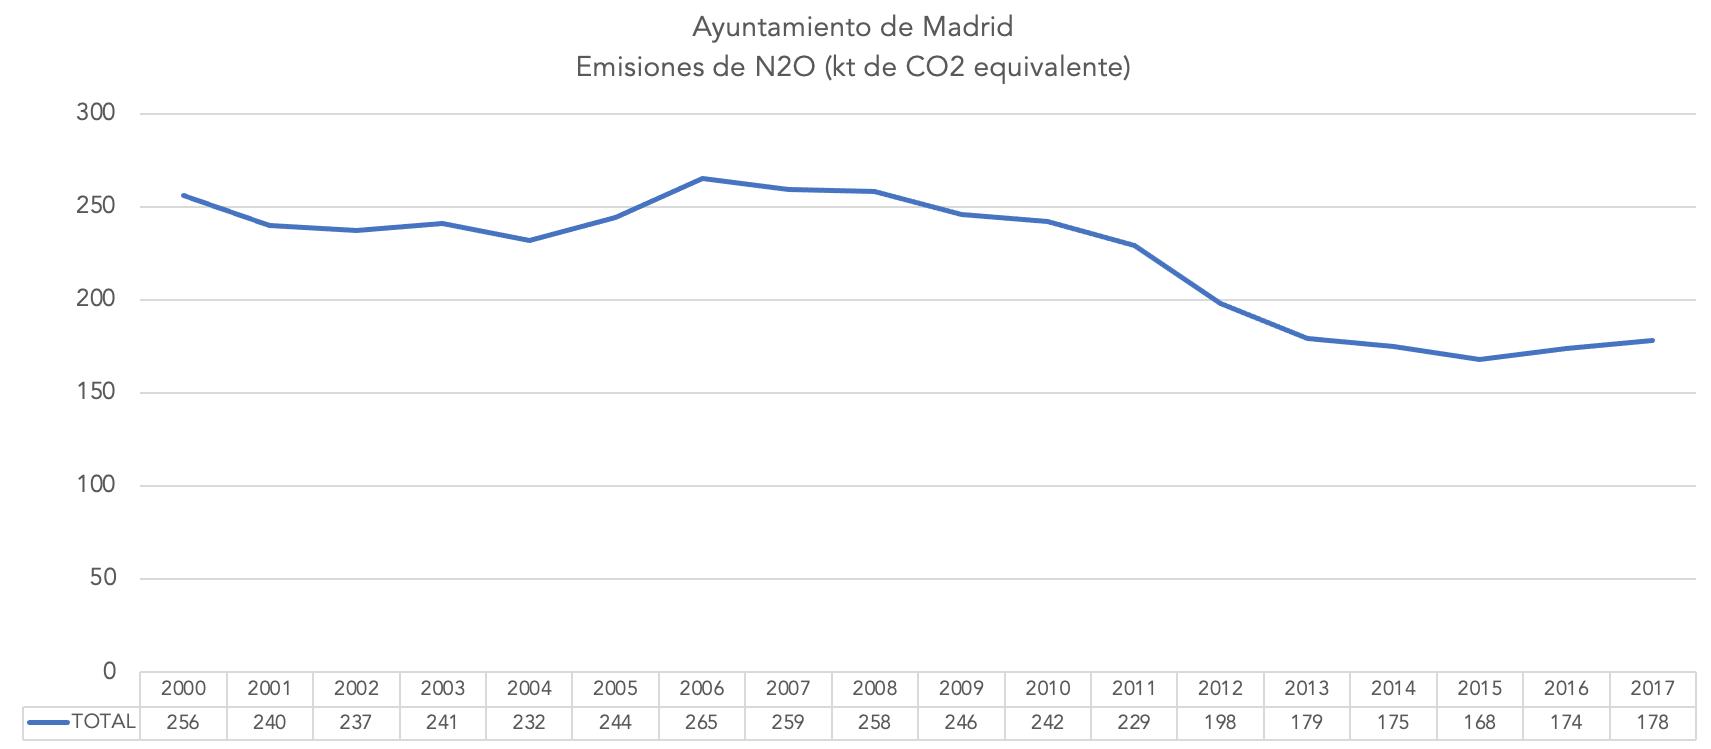 5-emisiones-n2o-ayuntamiento-madrid.png